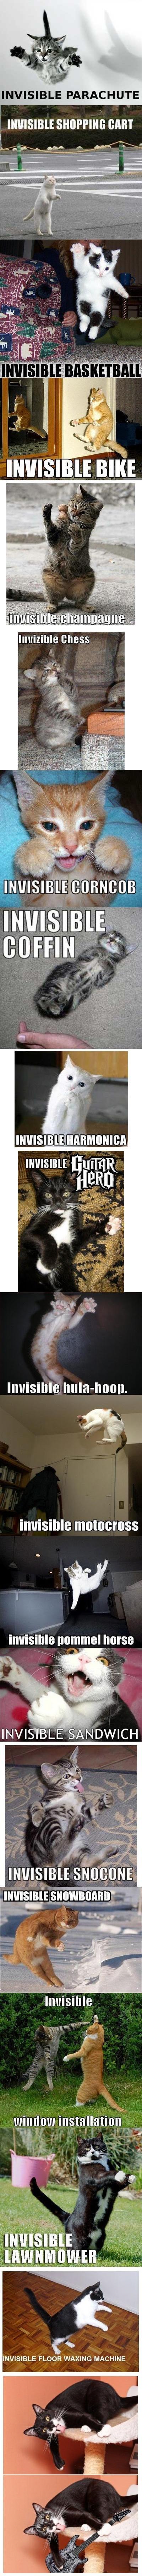 Invisible Kitty Compendium